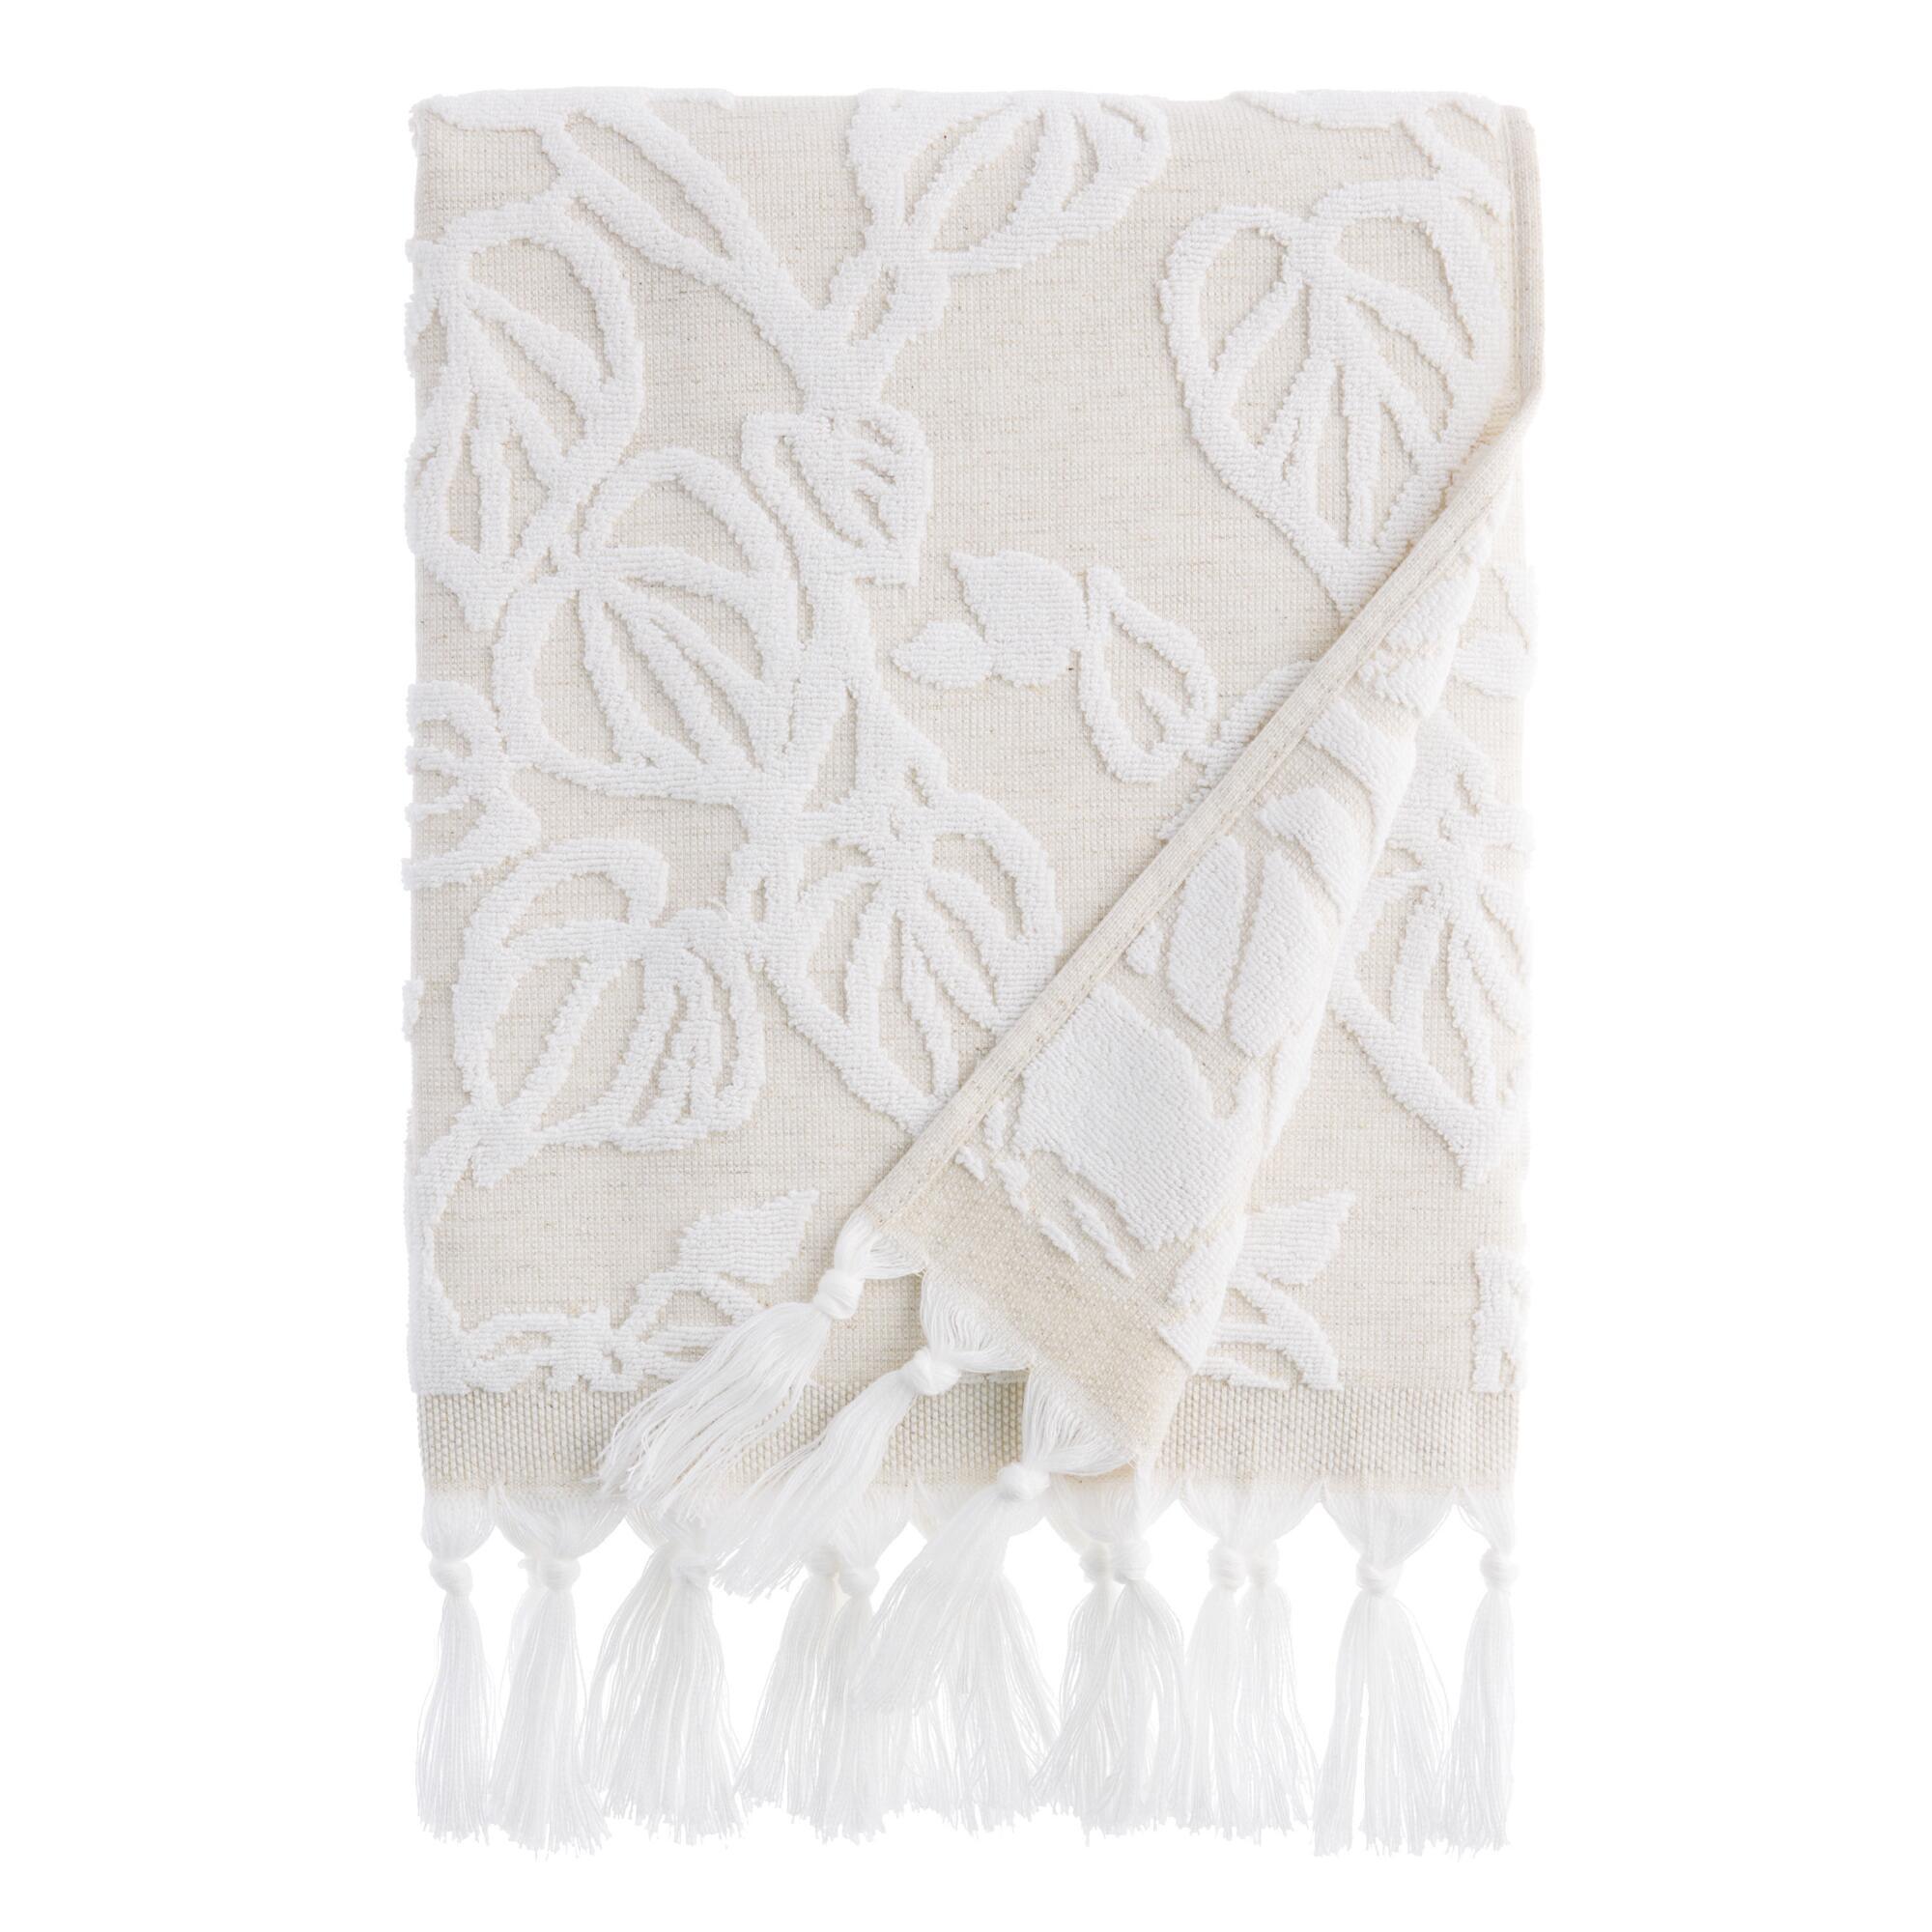 Natural And White Sculpted Vine Katsura Bath Towel